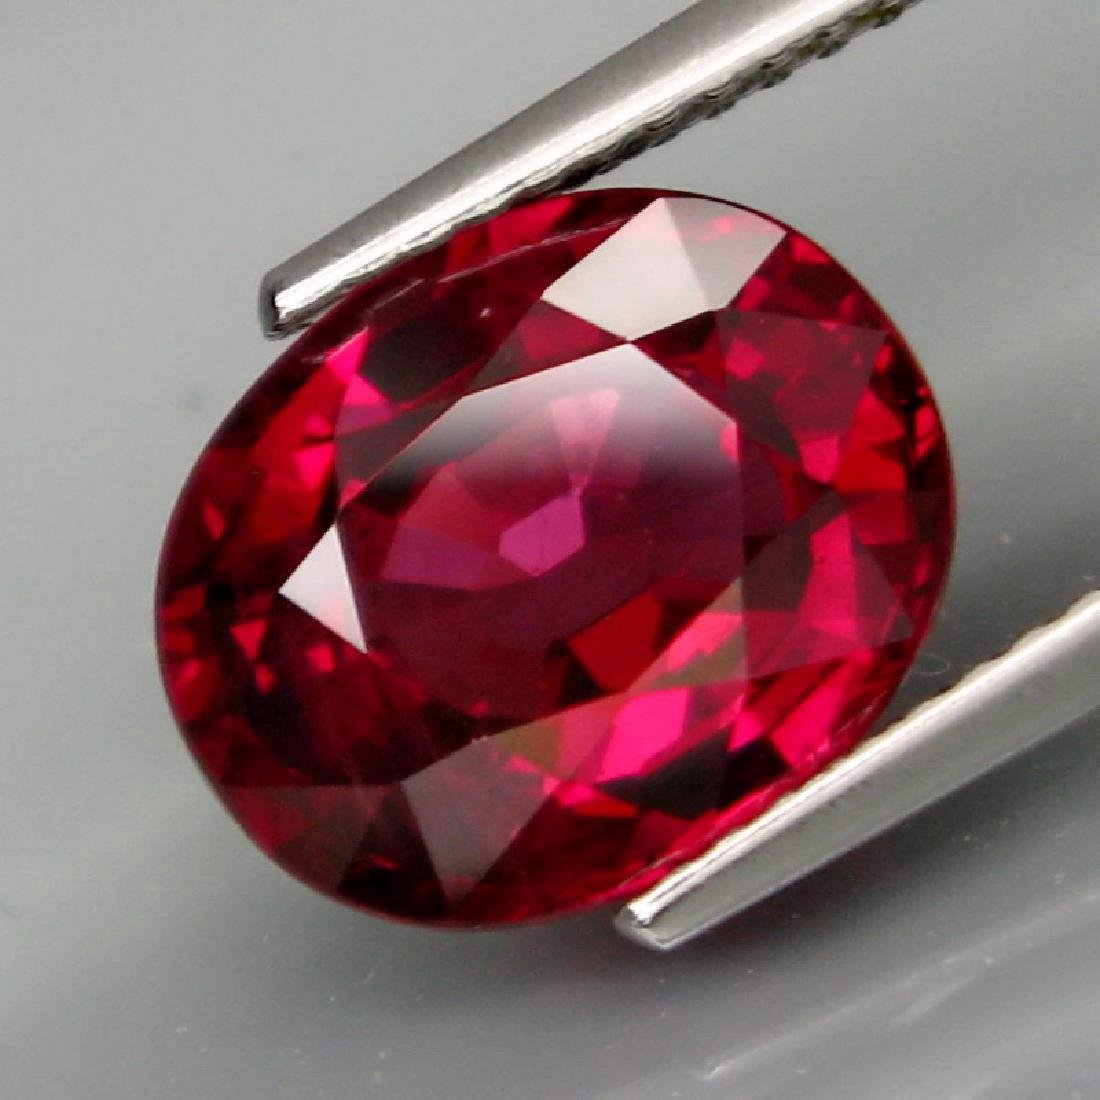 Loose Stone 4.95 Carat Rhodolite Garnet